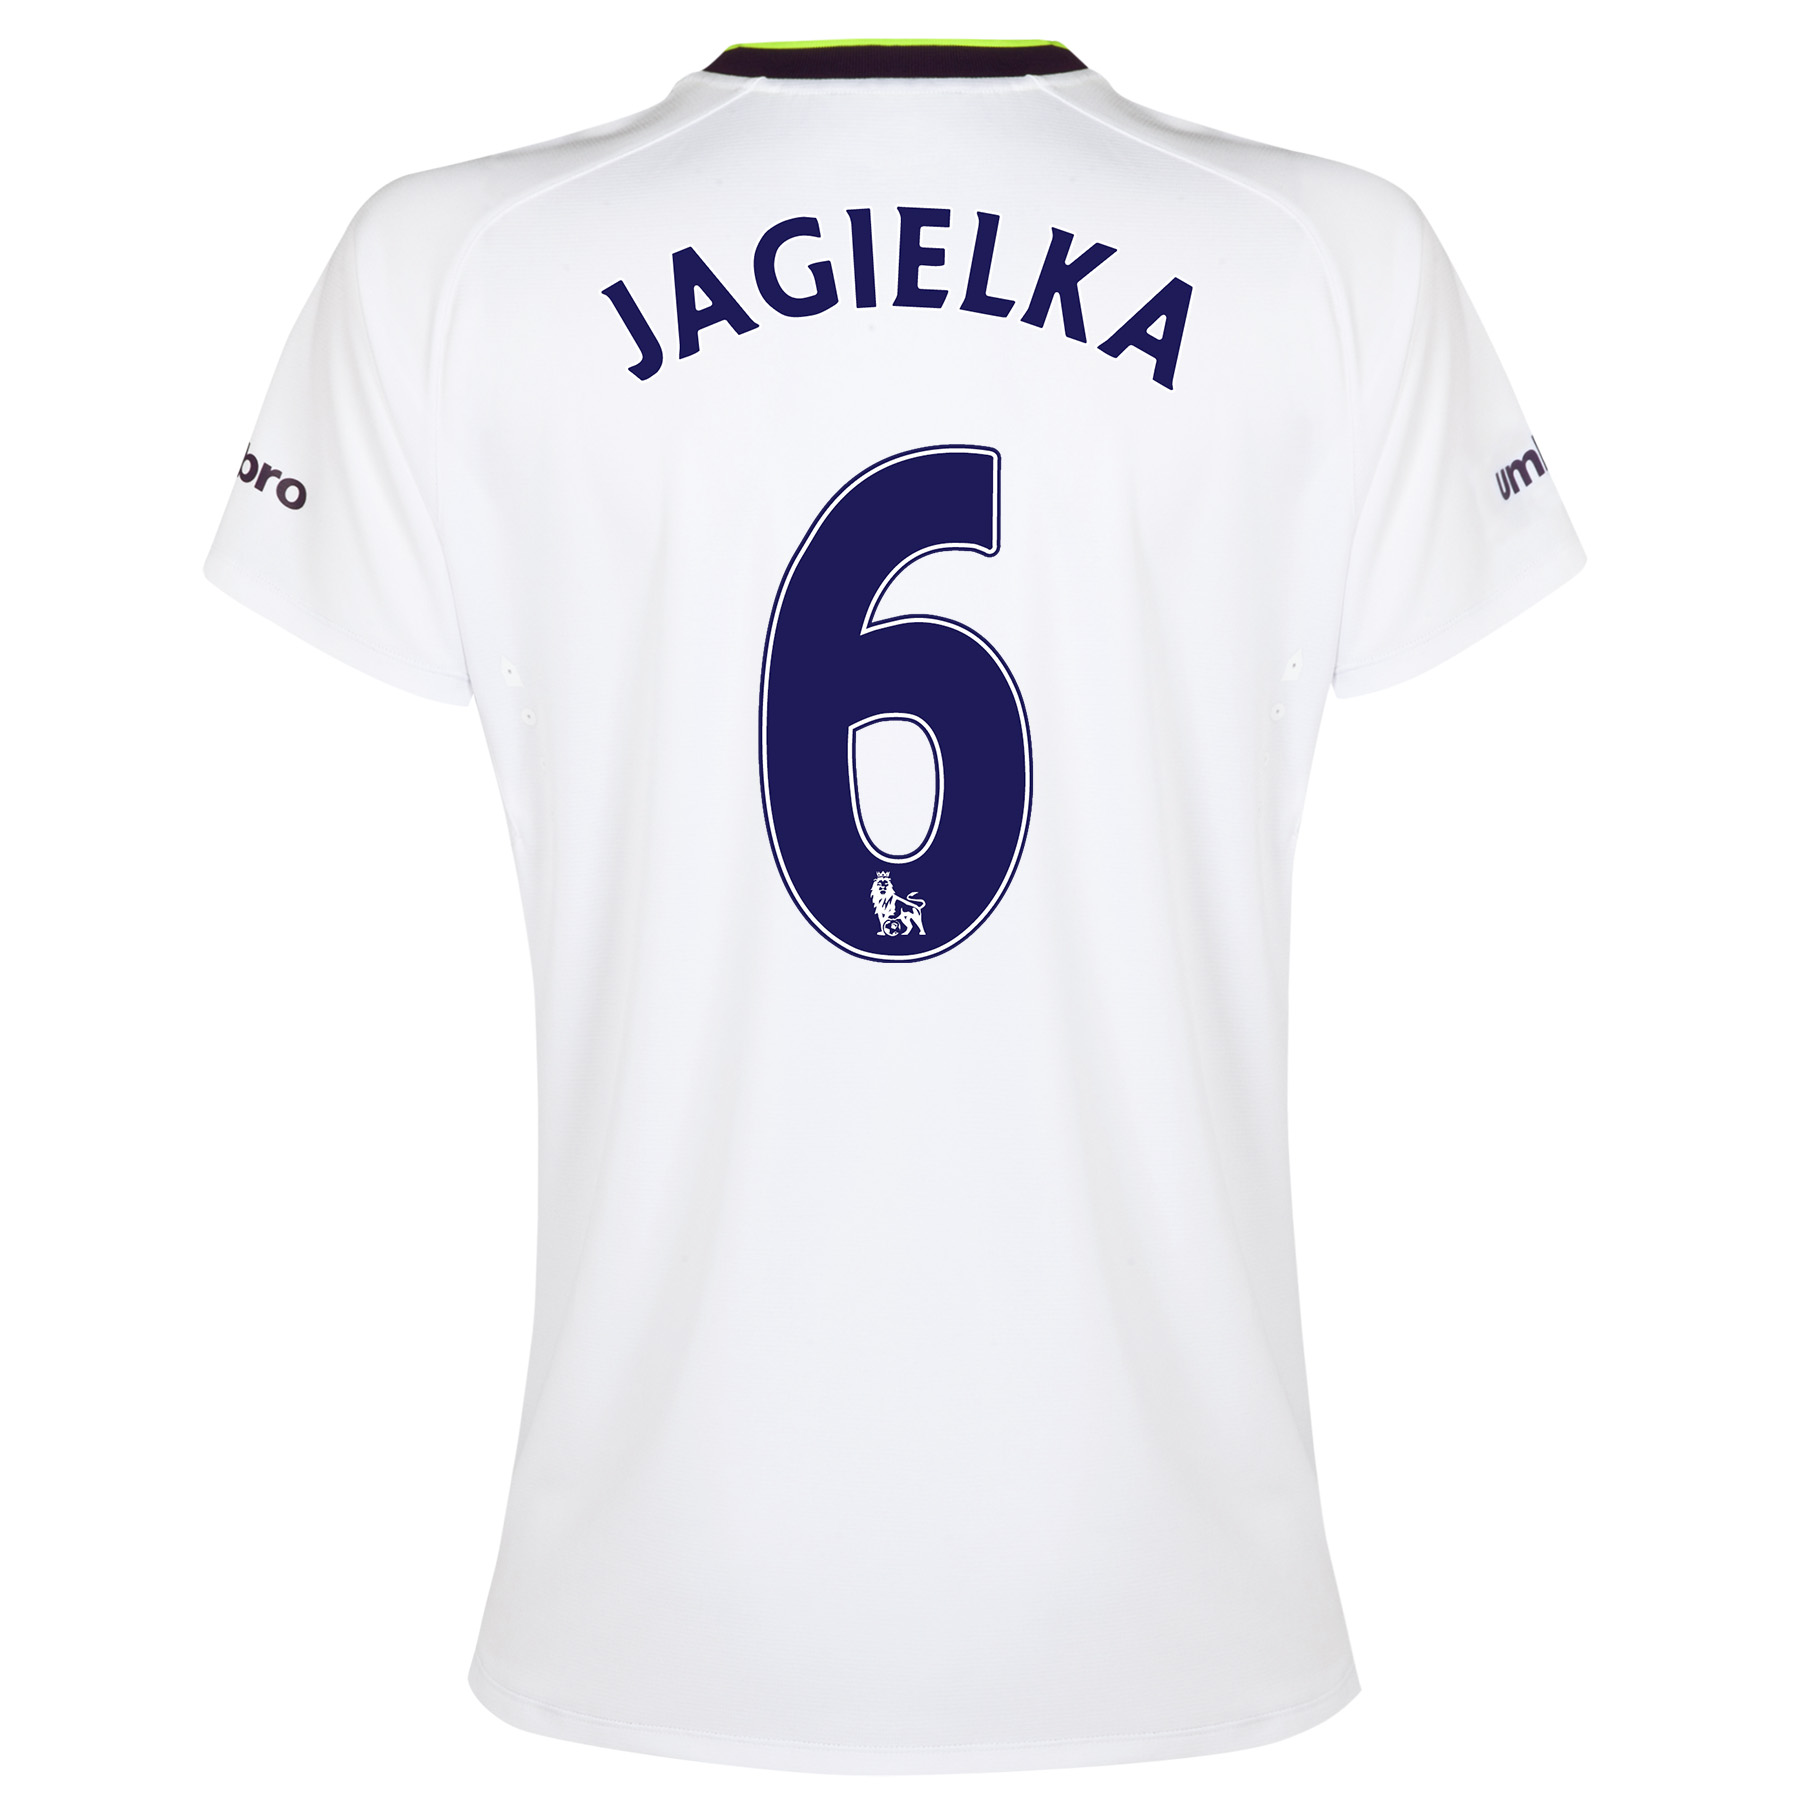 Everton SS 3rd Shirt 2014/15- Womens with Jagielka 6 printing